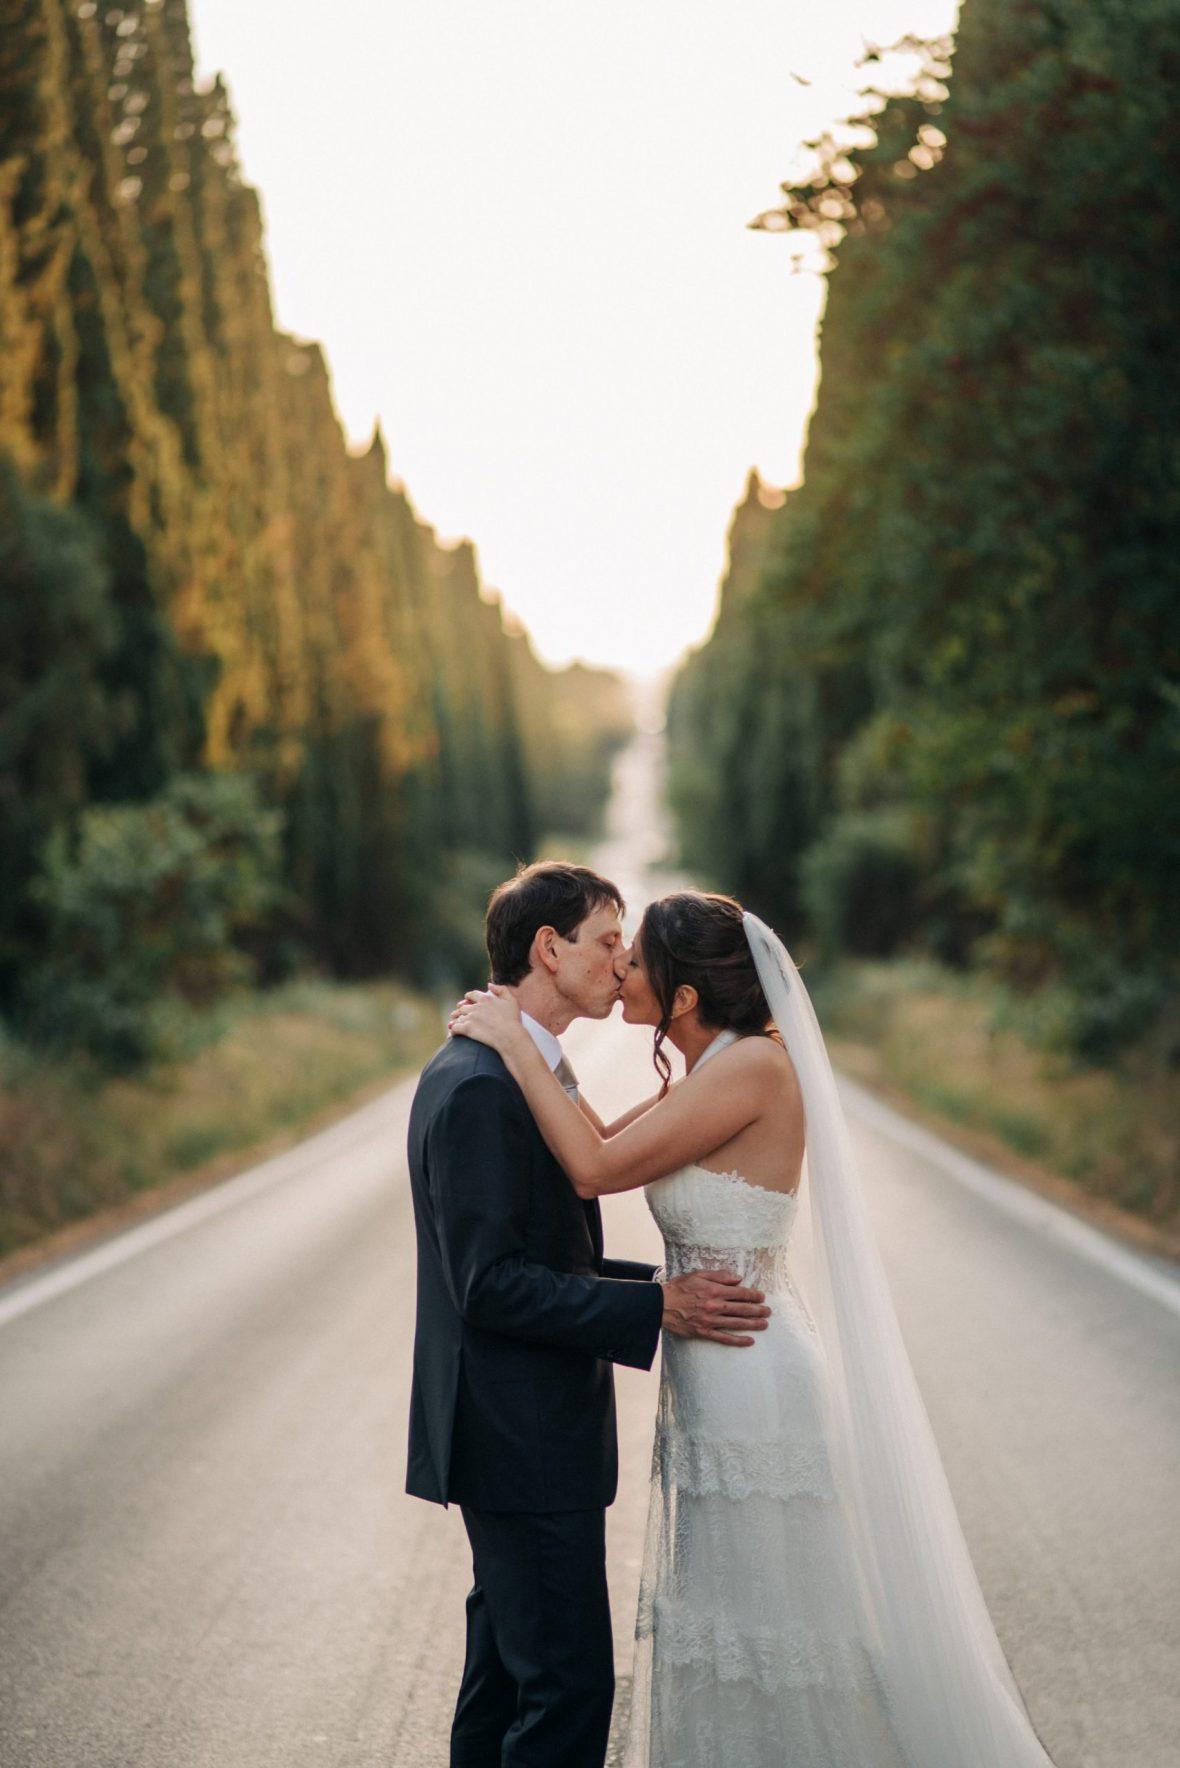 Matrimonio Toscana Viale Bolgheri